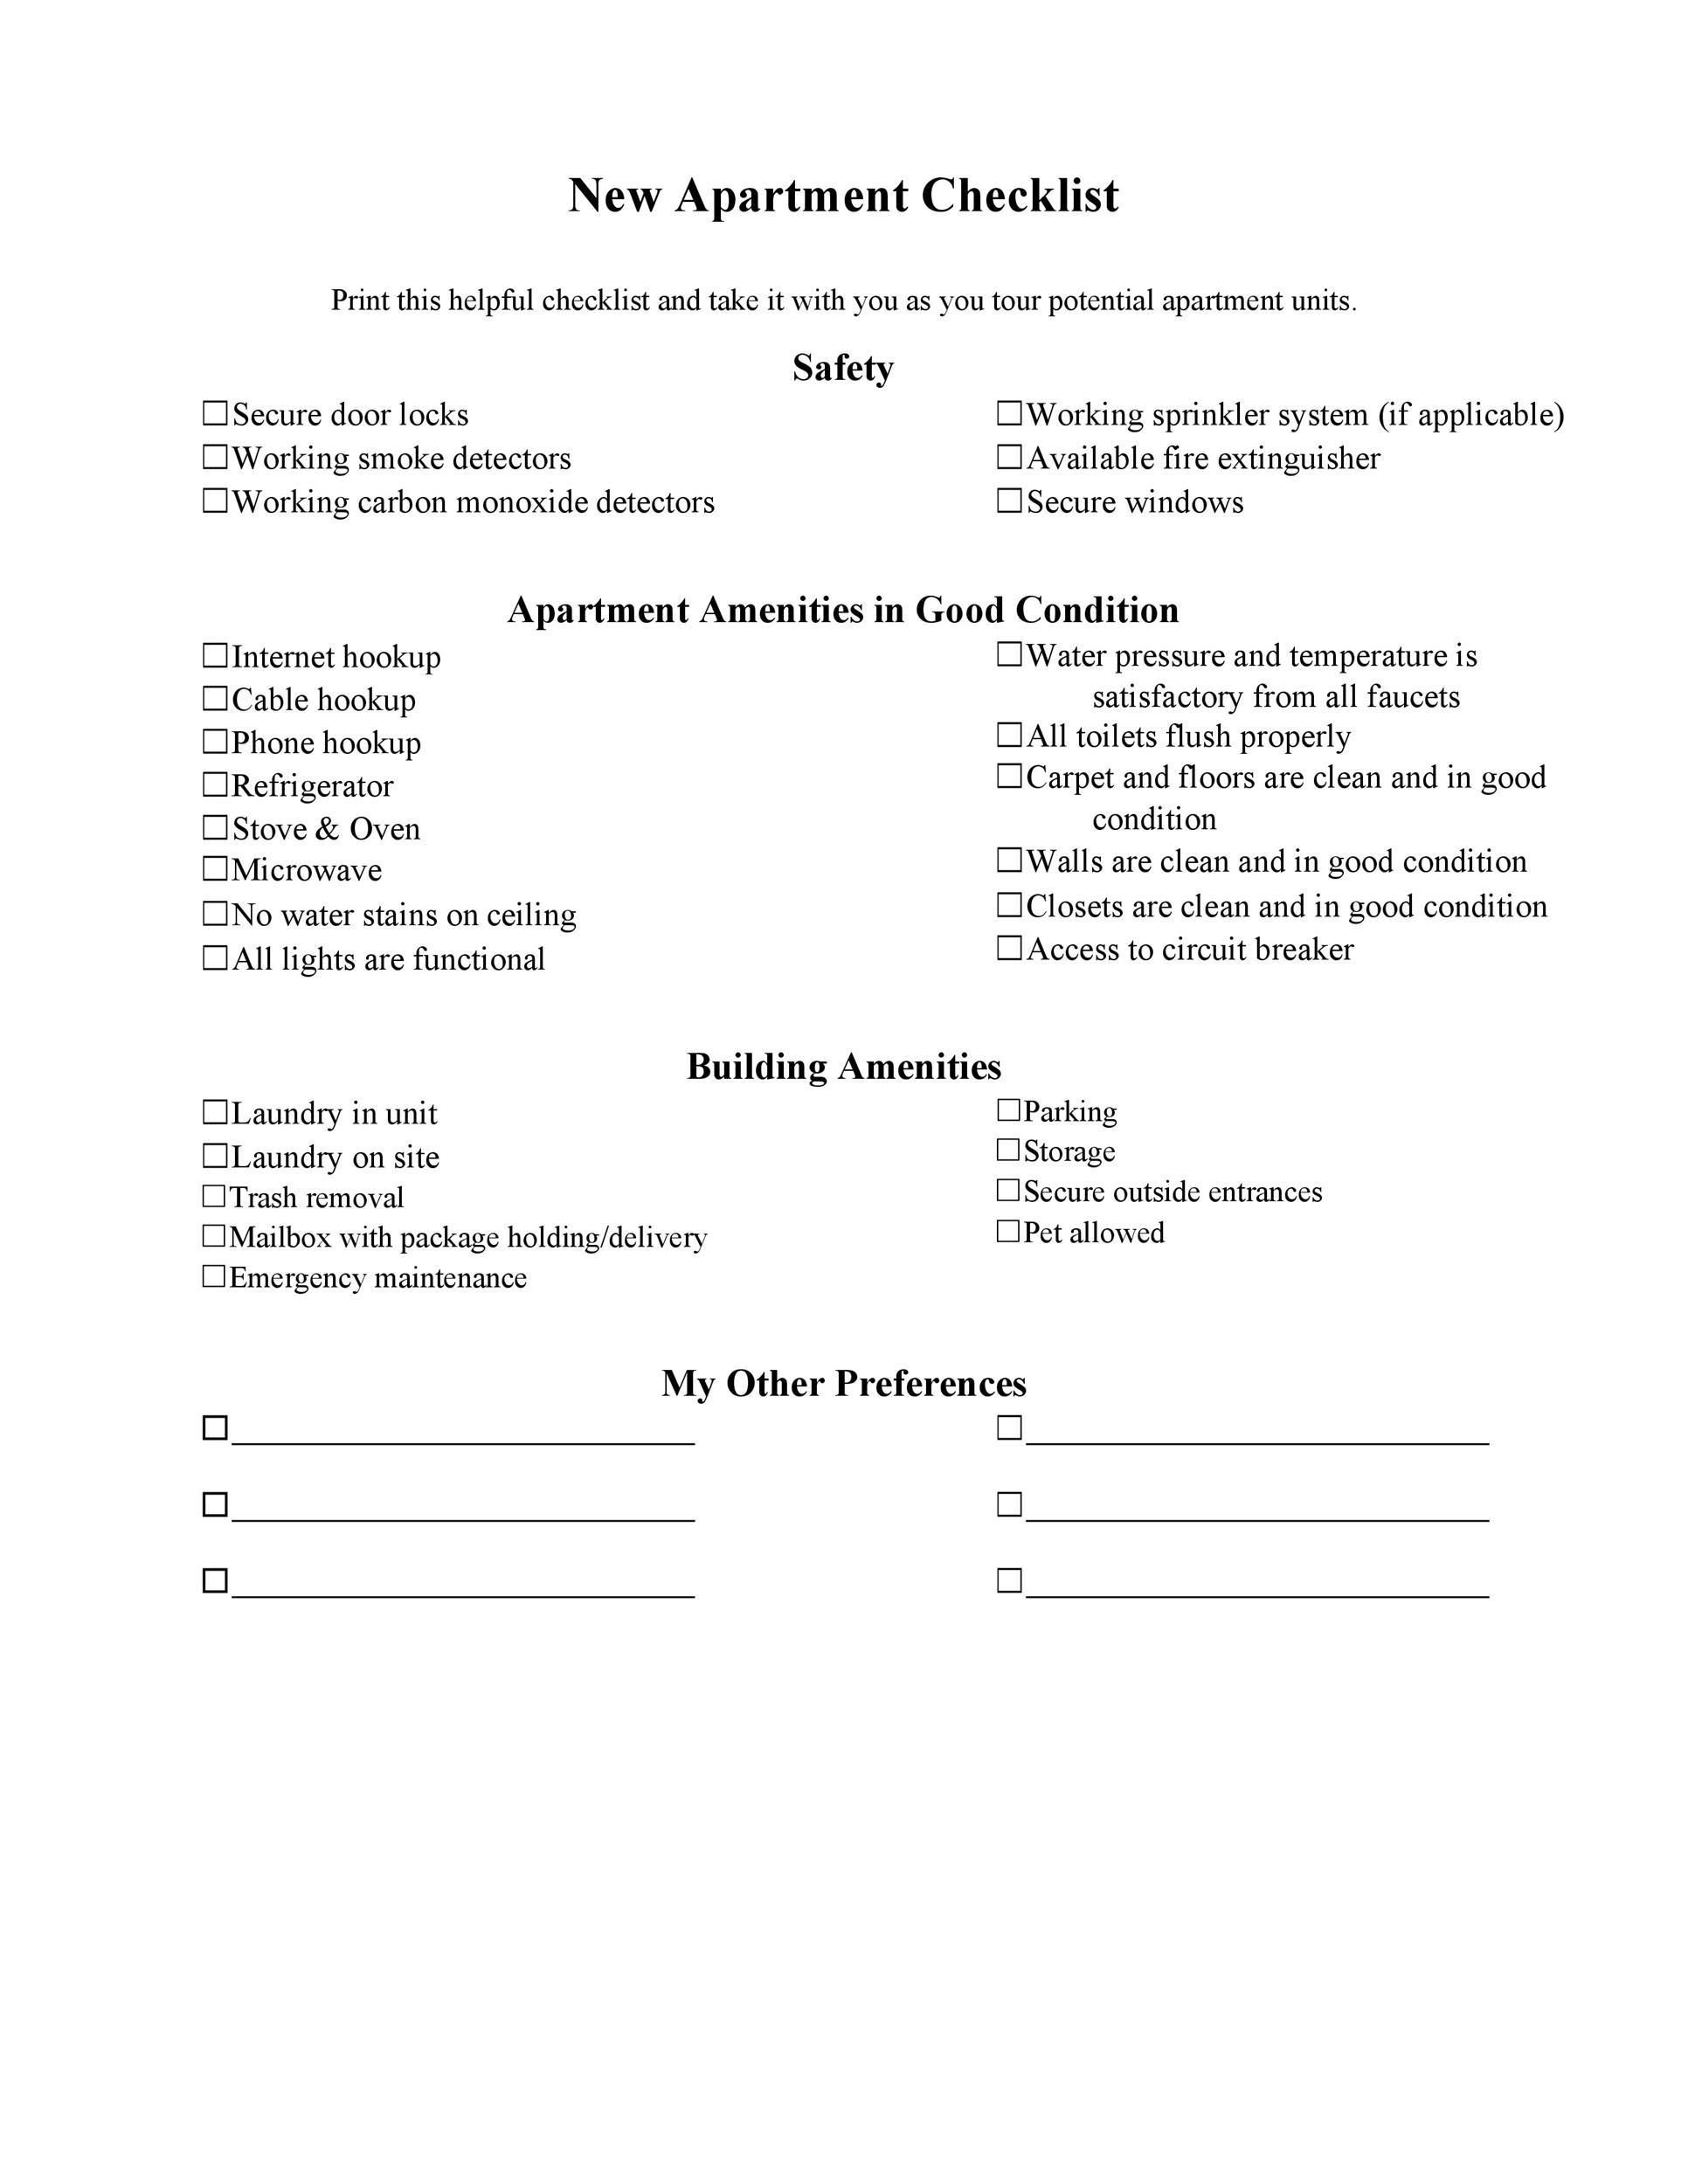 Free apartment checklist 19